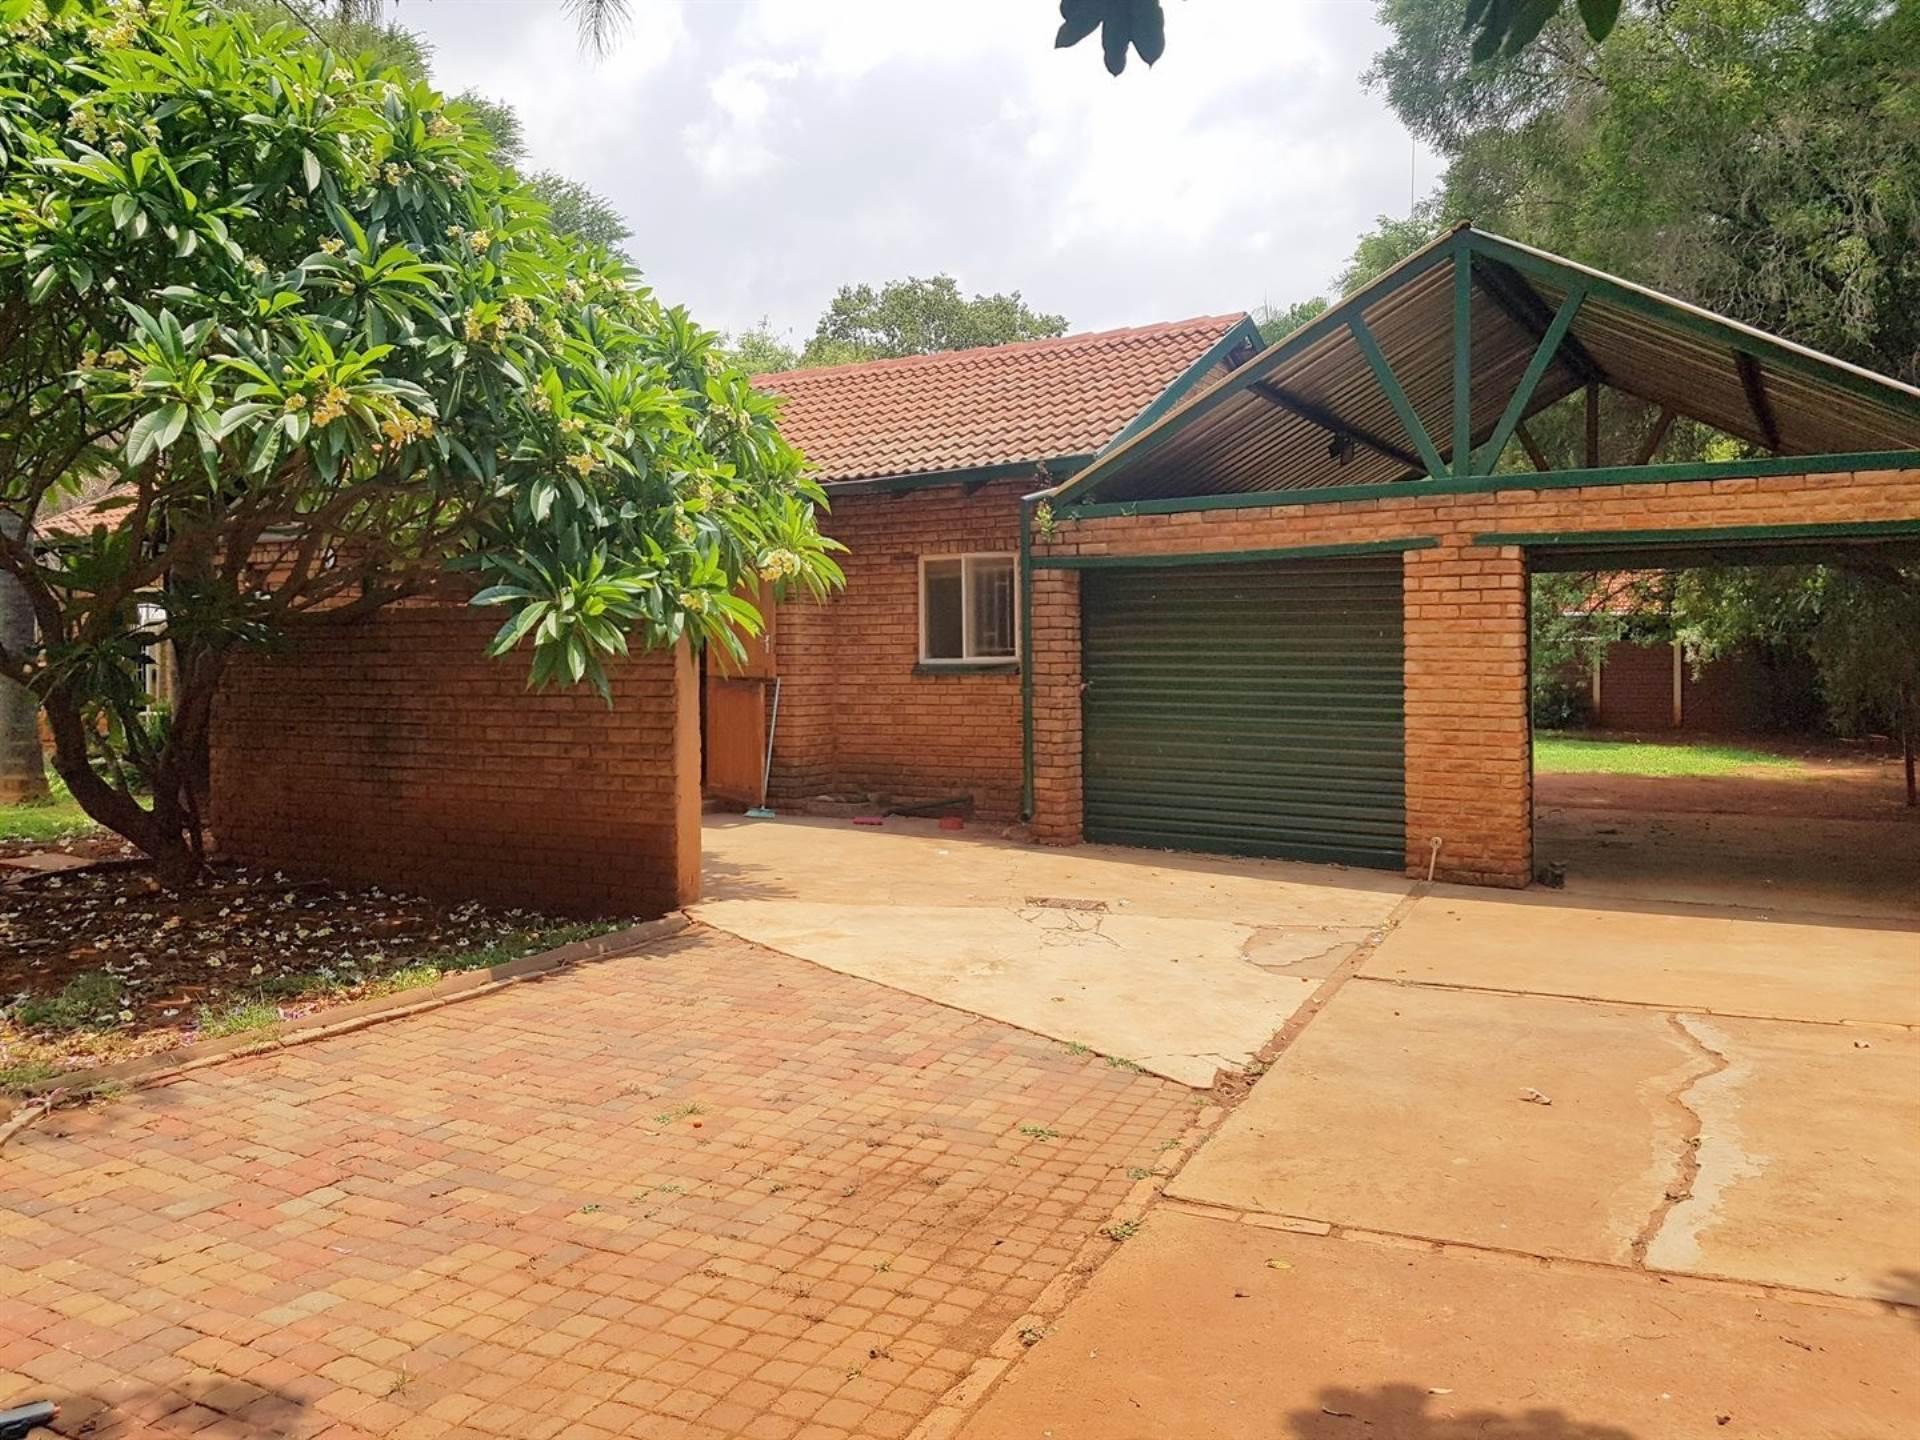 3 BedroomHouse For Sale In Eldorette